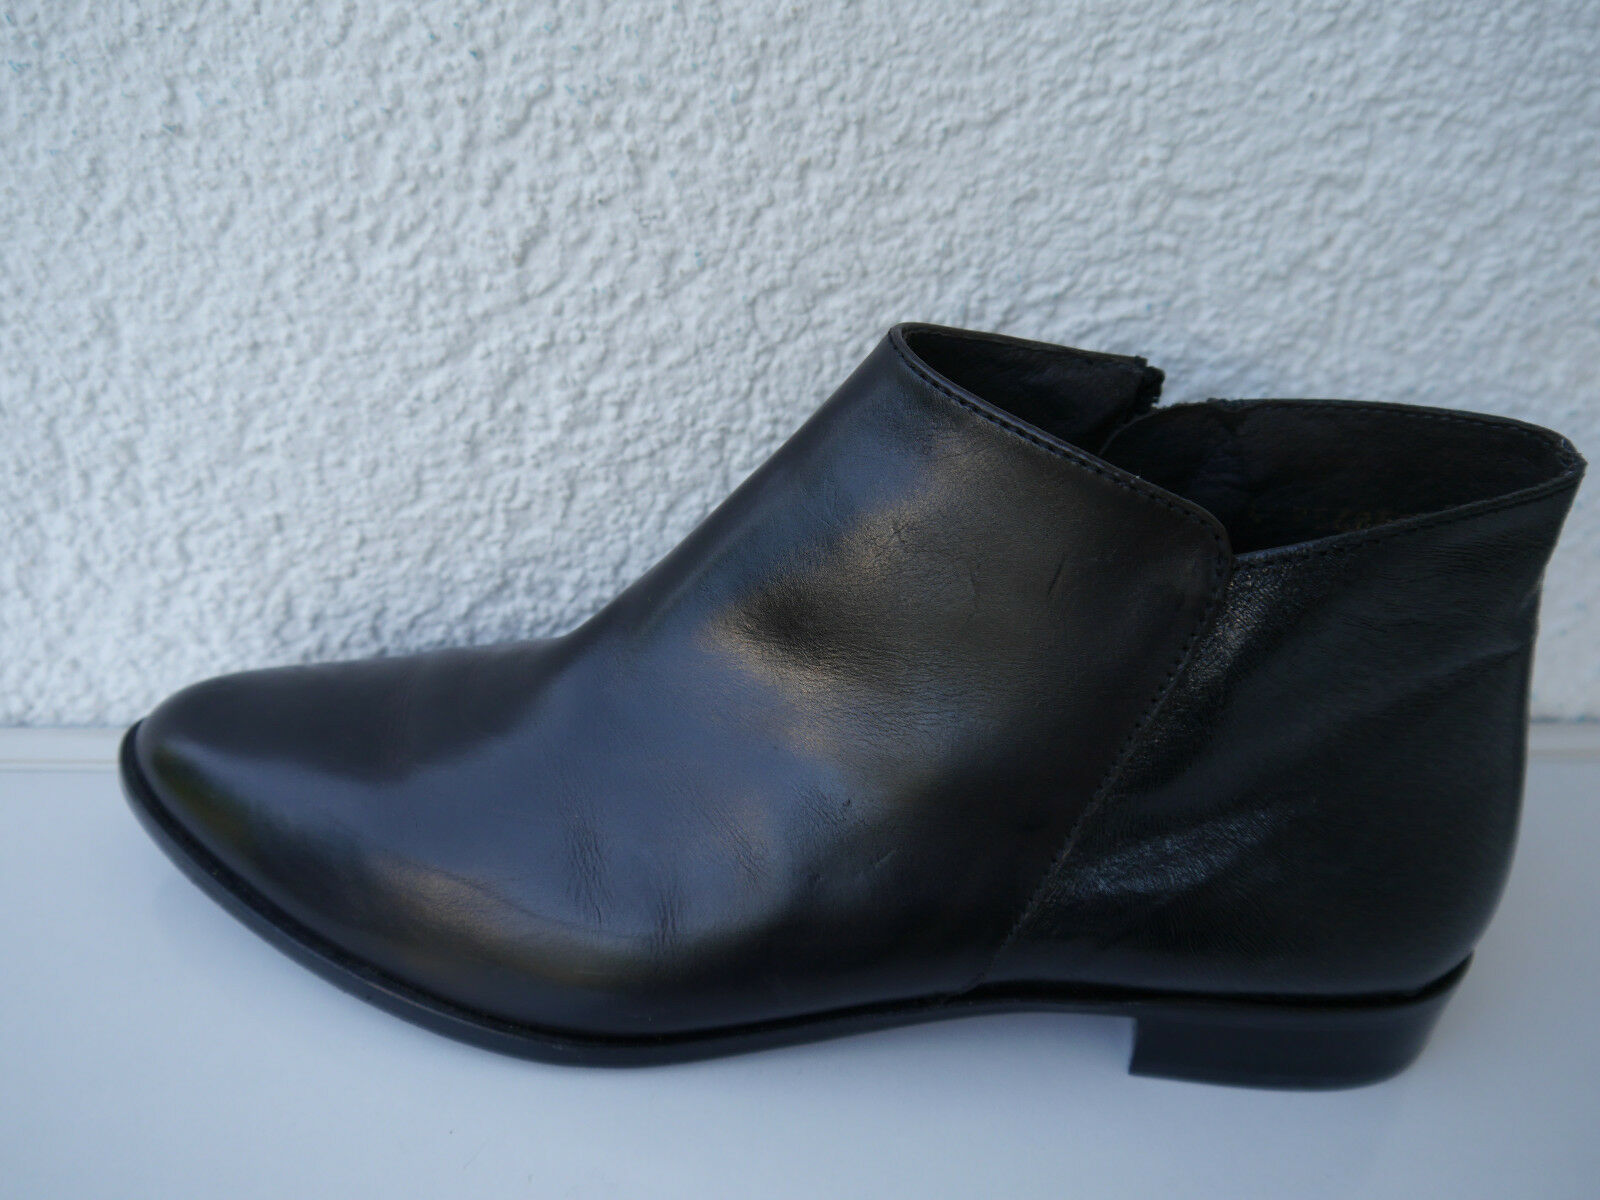 GADEA DAMEN STIEFELETTEN STIEFEL Stiefel LEDER NEU Gr 40 40 40 f5fb68